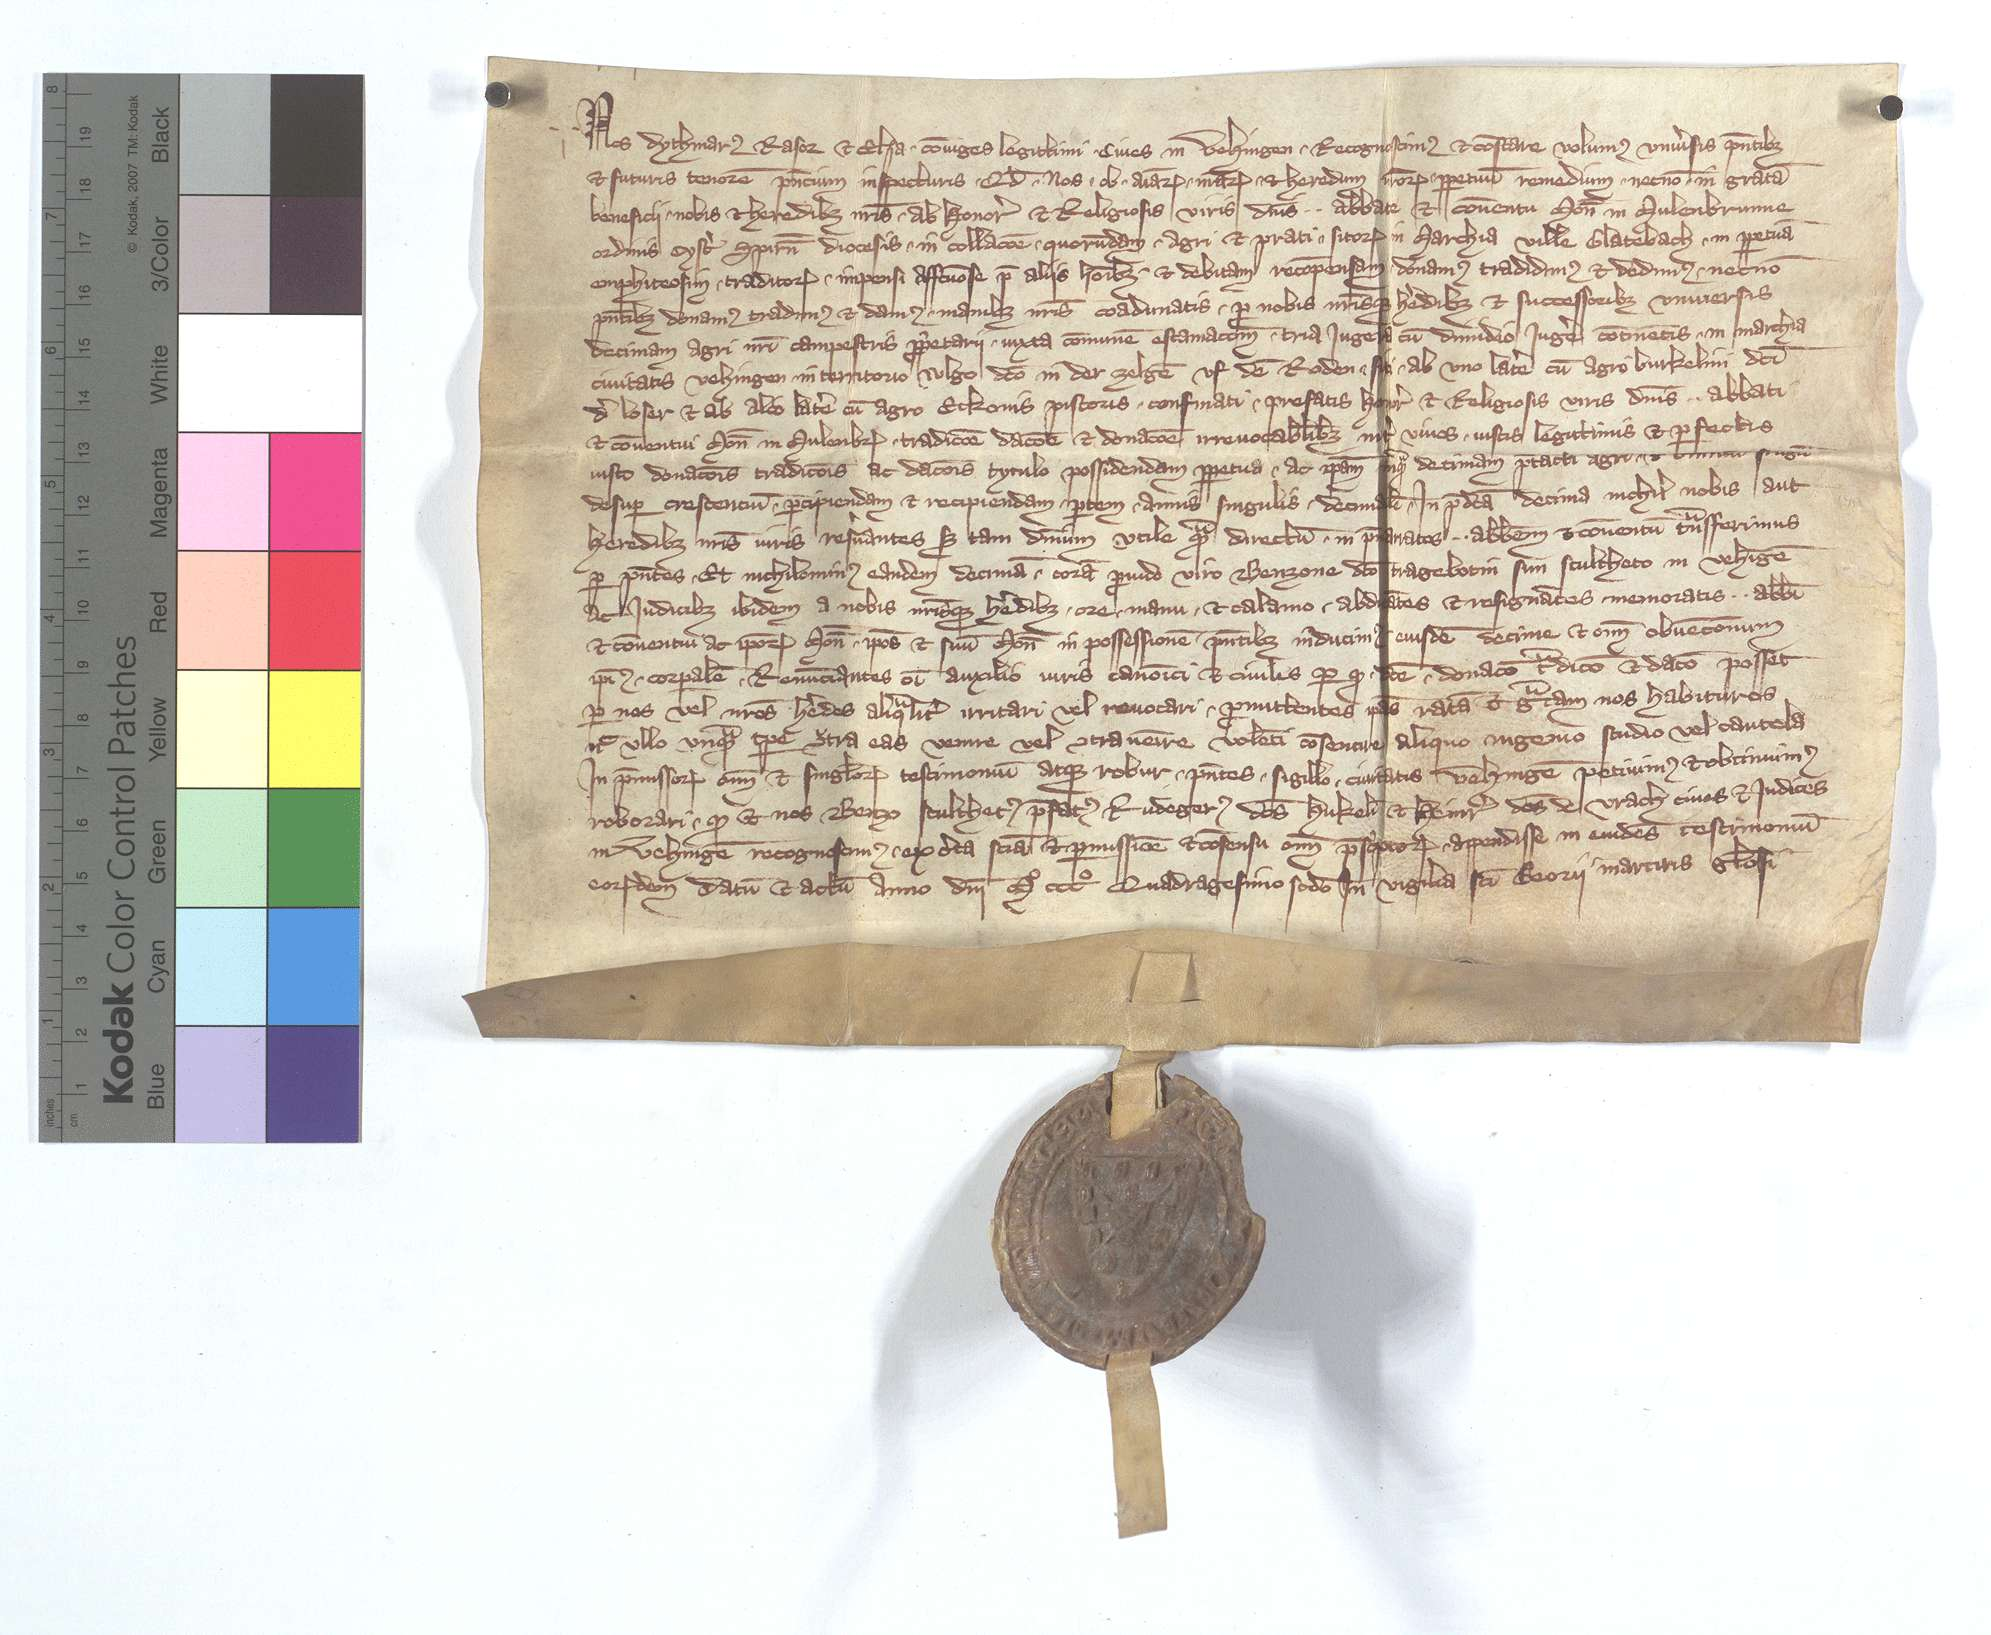 Erblehensrevers Dietmar (Dytmar) Rasors von Vaihingen (Vehingen) gegen das Kloster Maulbronn um die Güter in Glattbach (Glatebach)., Text